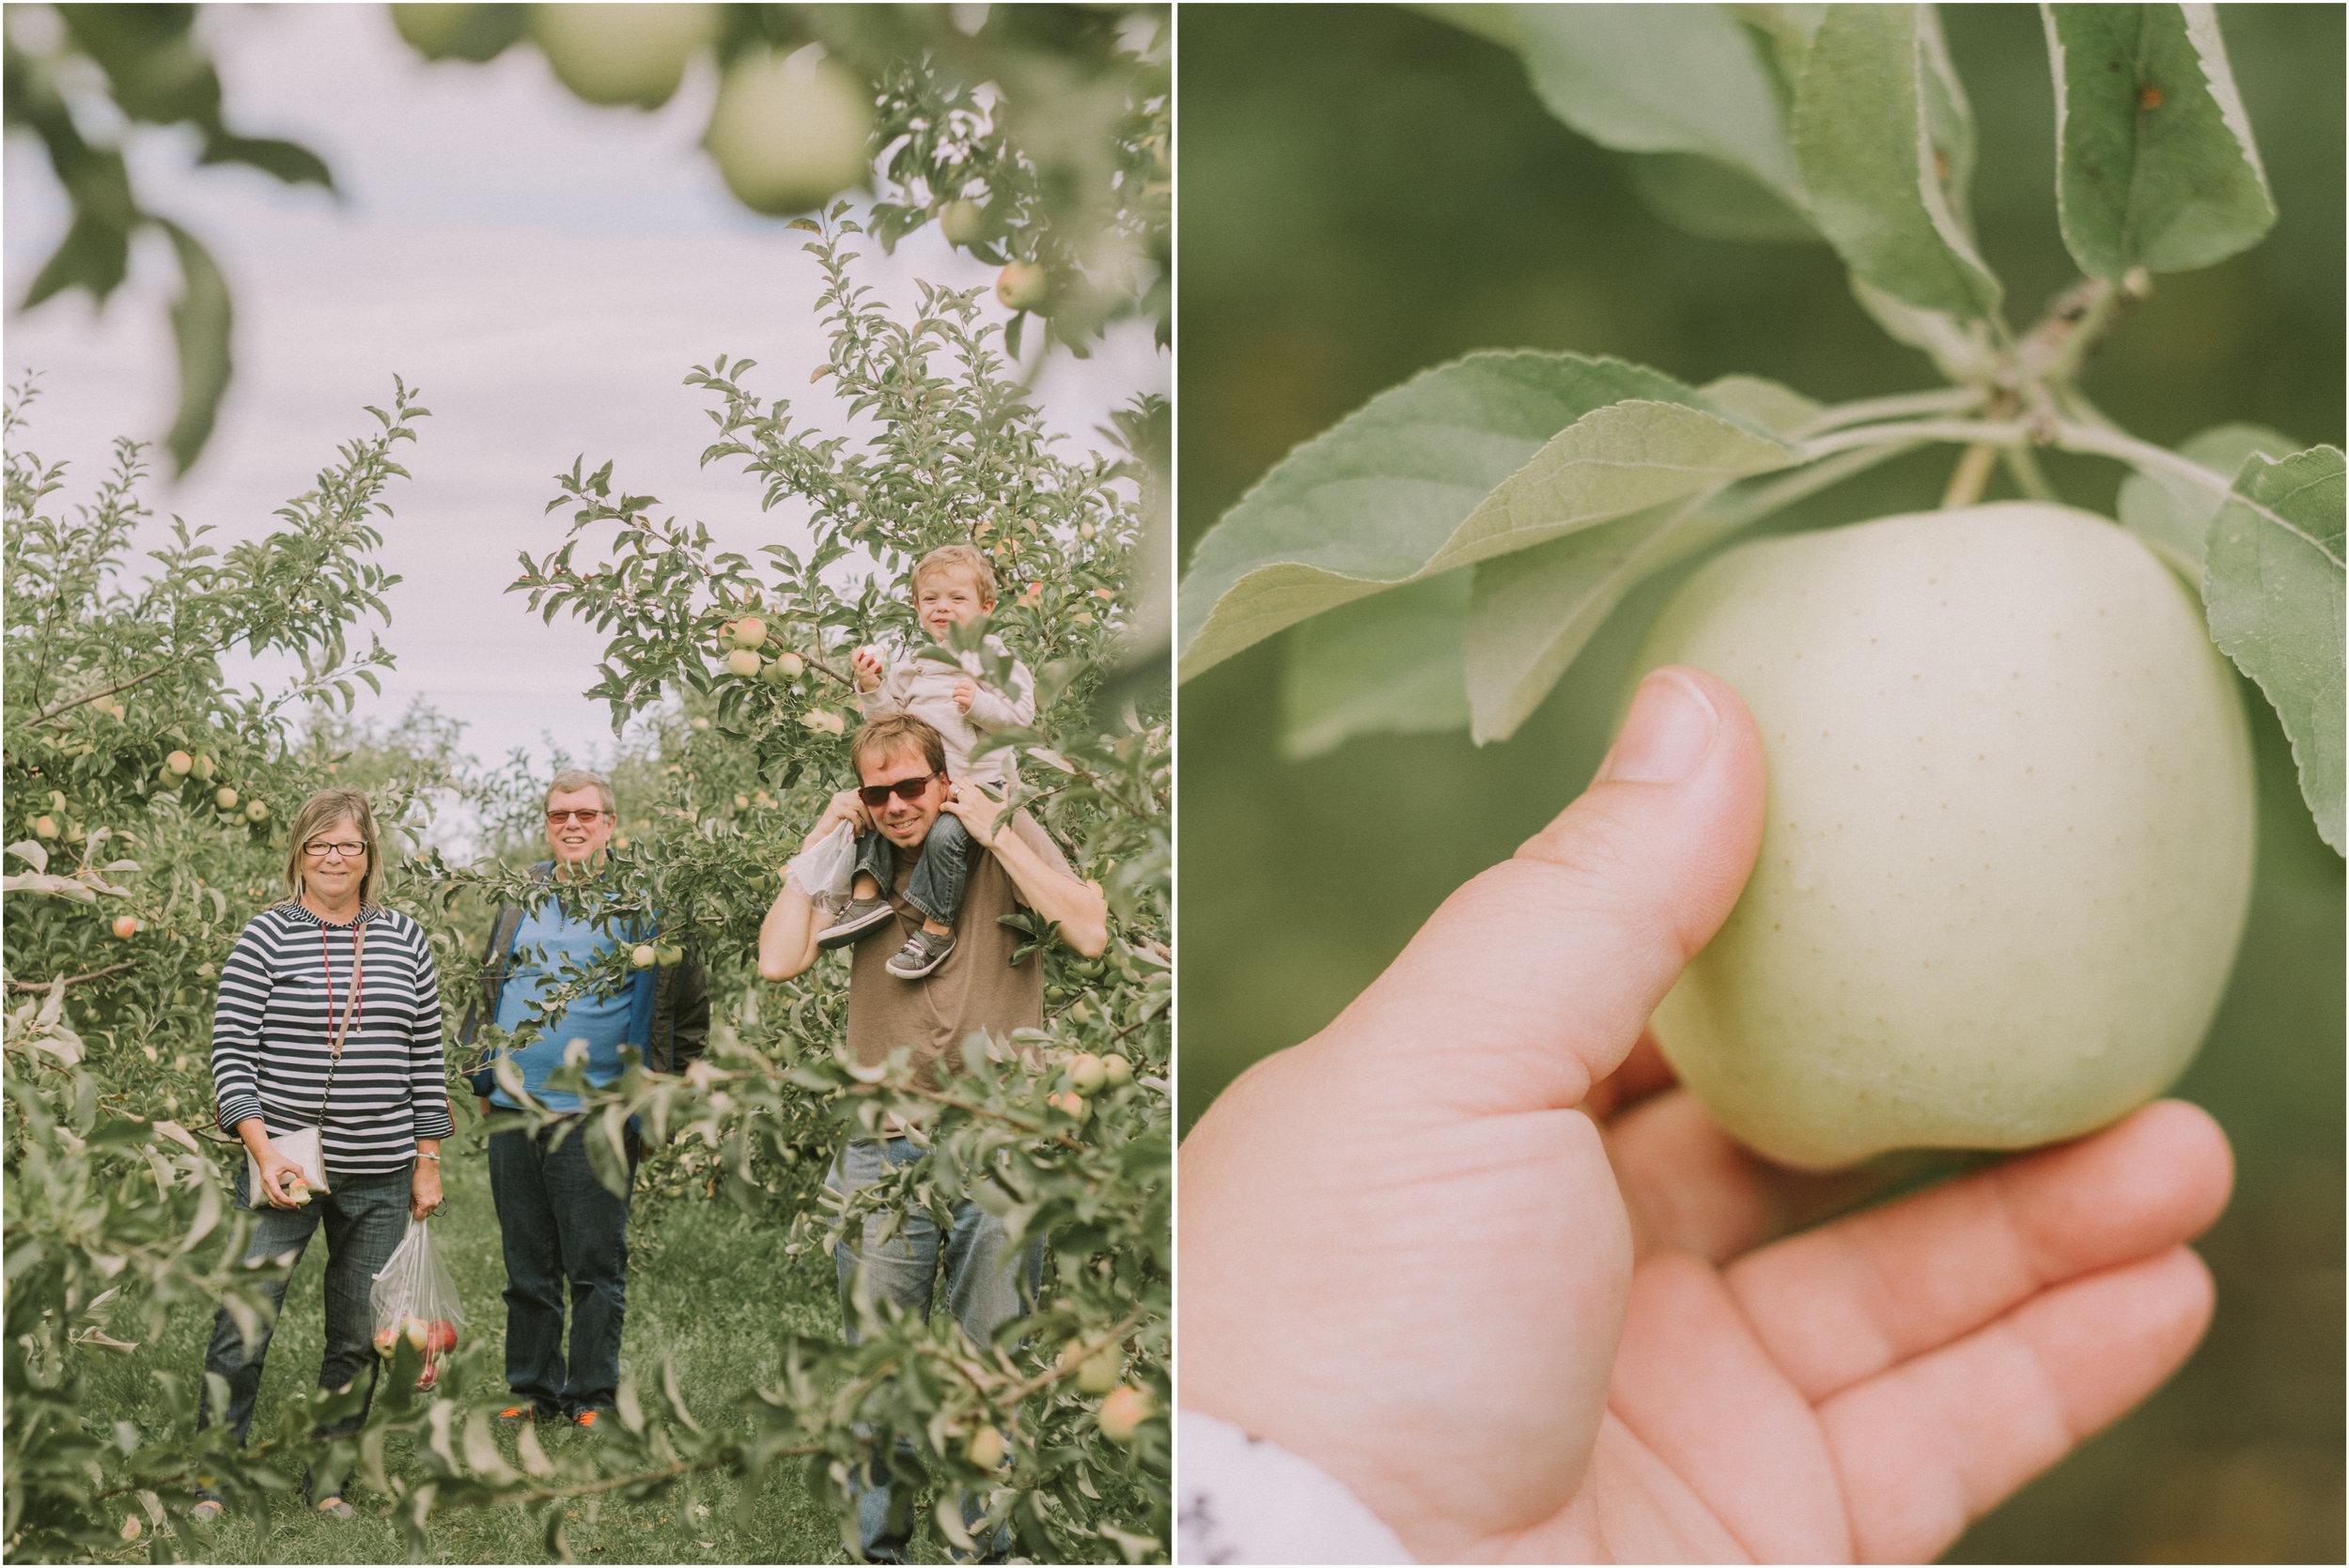 Wisconsin Apple Picking Documentry Photographer 4.jpg